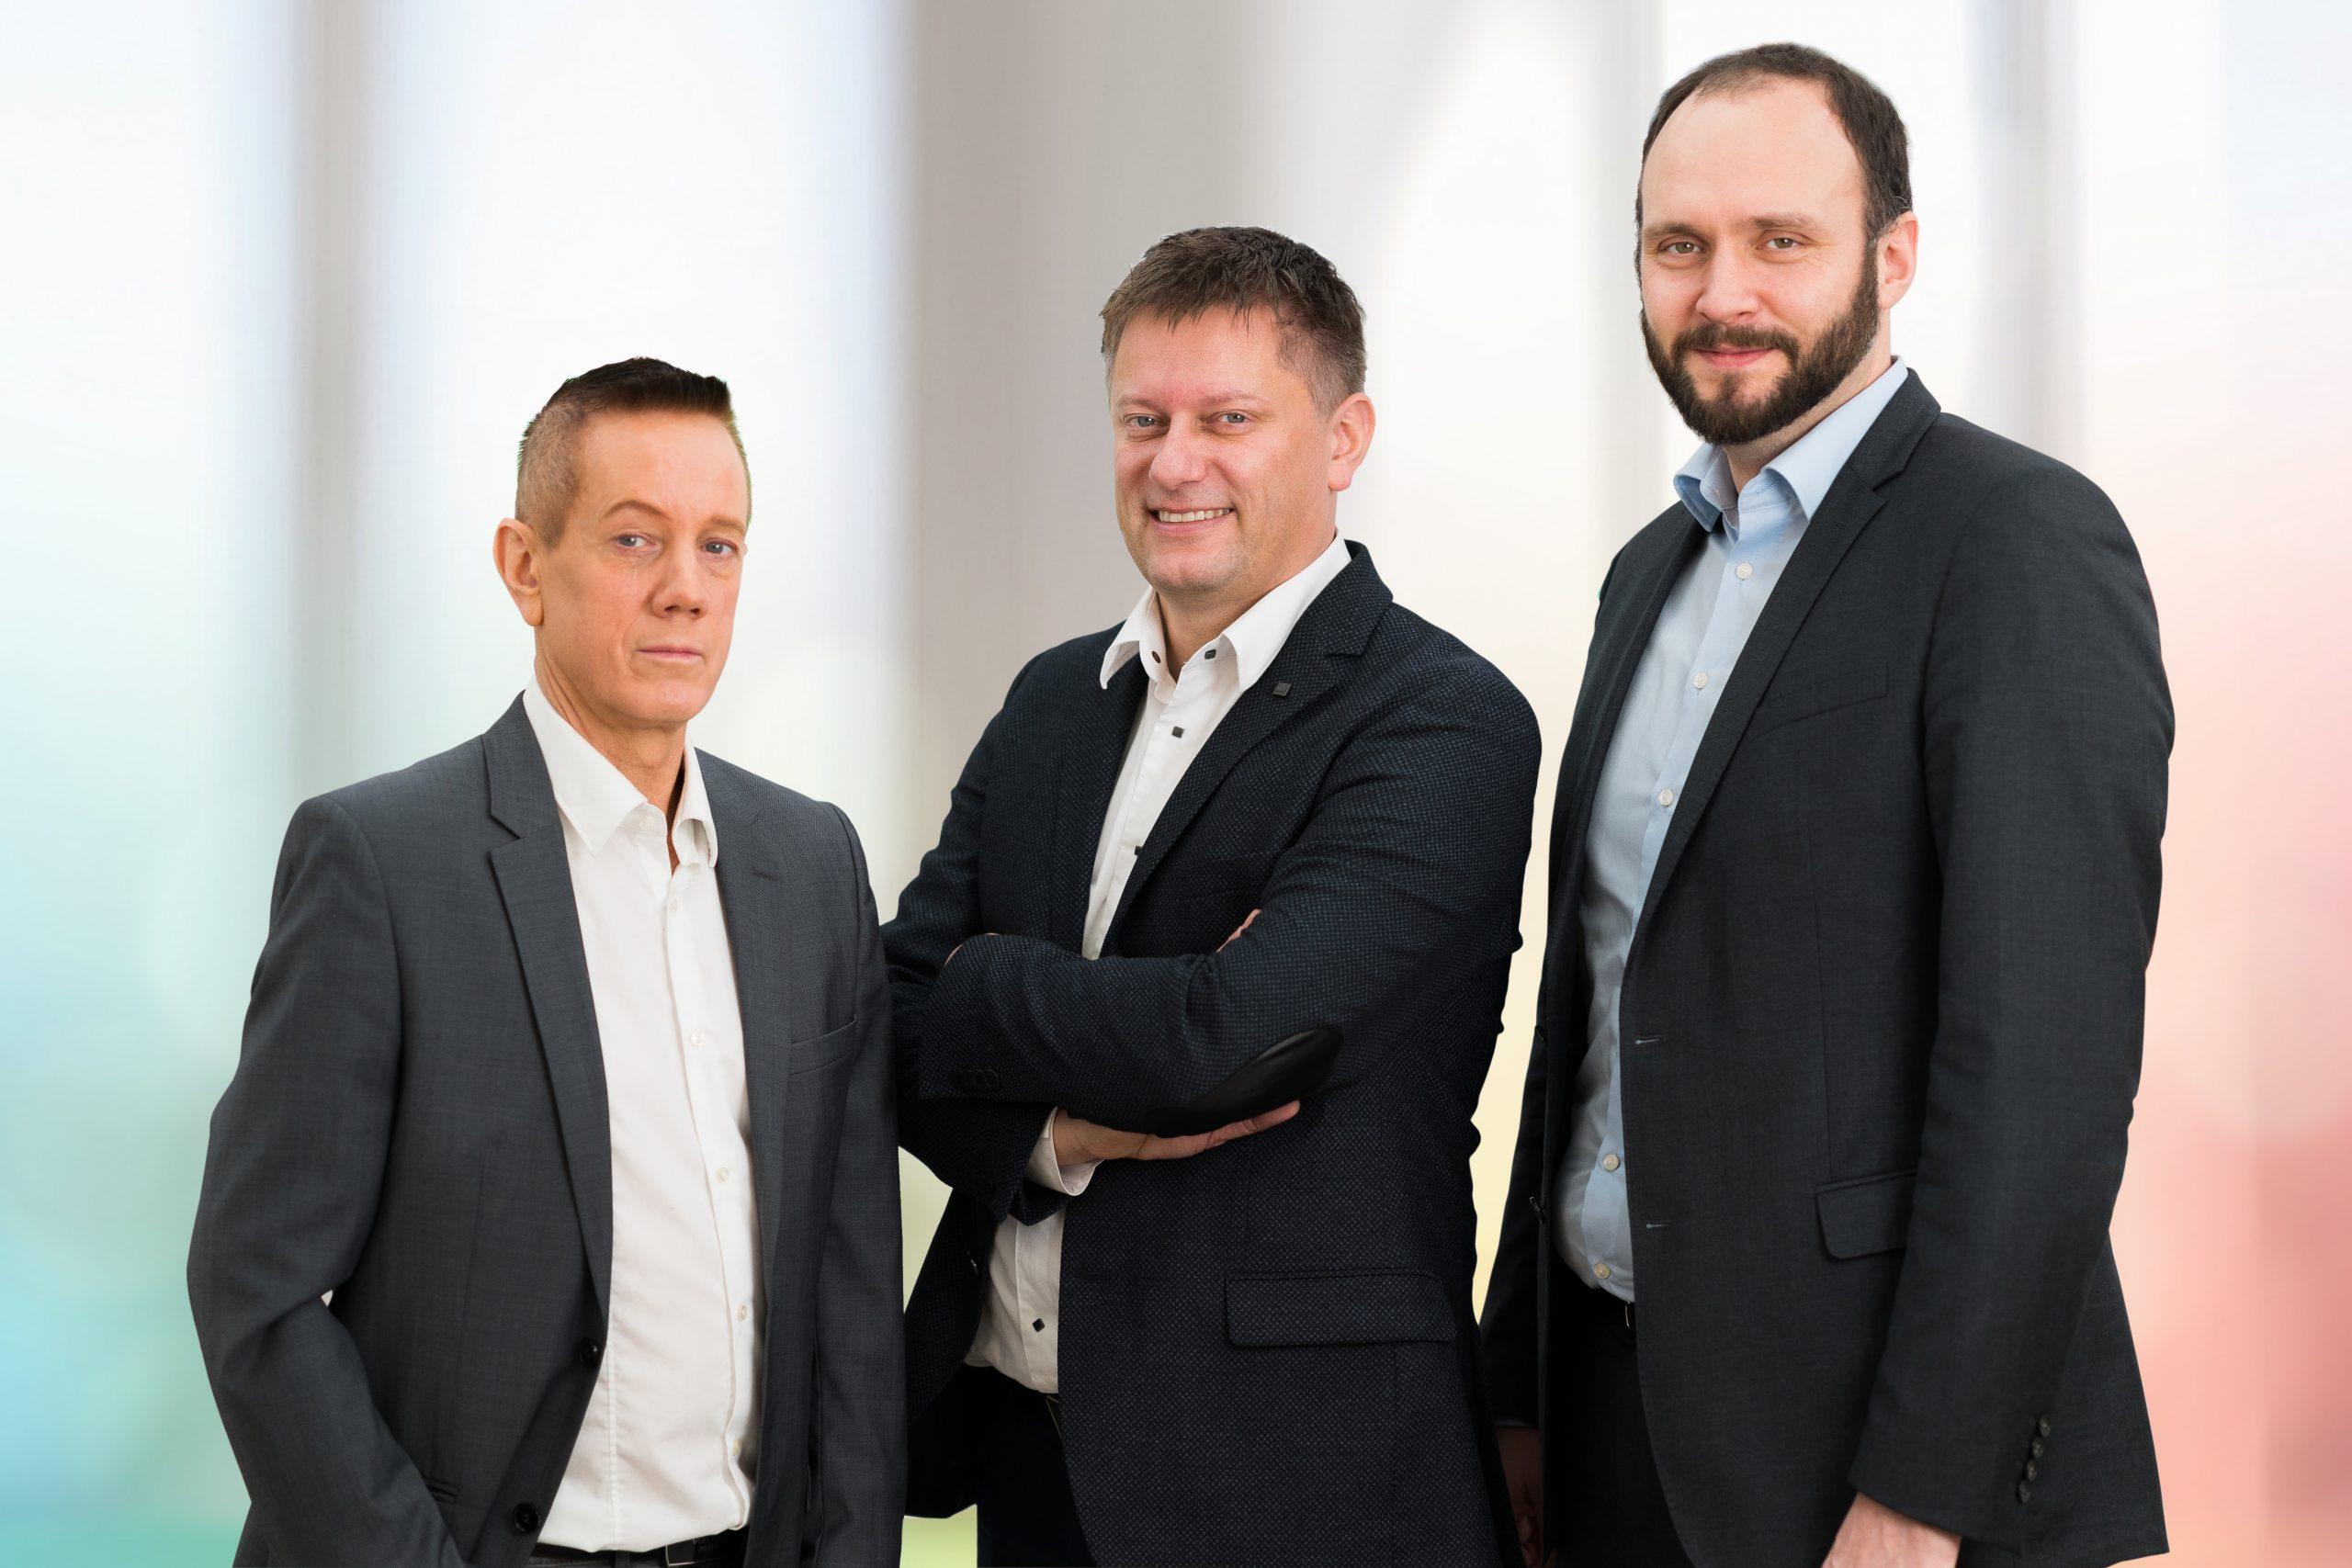 Managing Directors RP MEDICS GmbH Reinald Pasedag, Roland Pasedag, Andreas Hainz